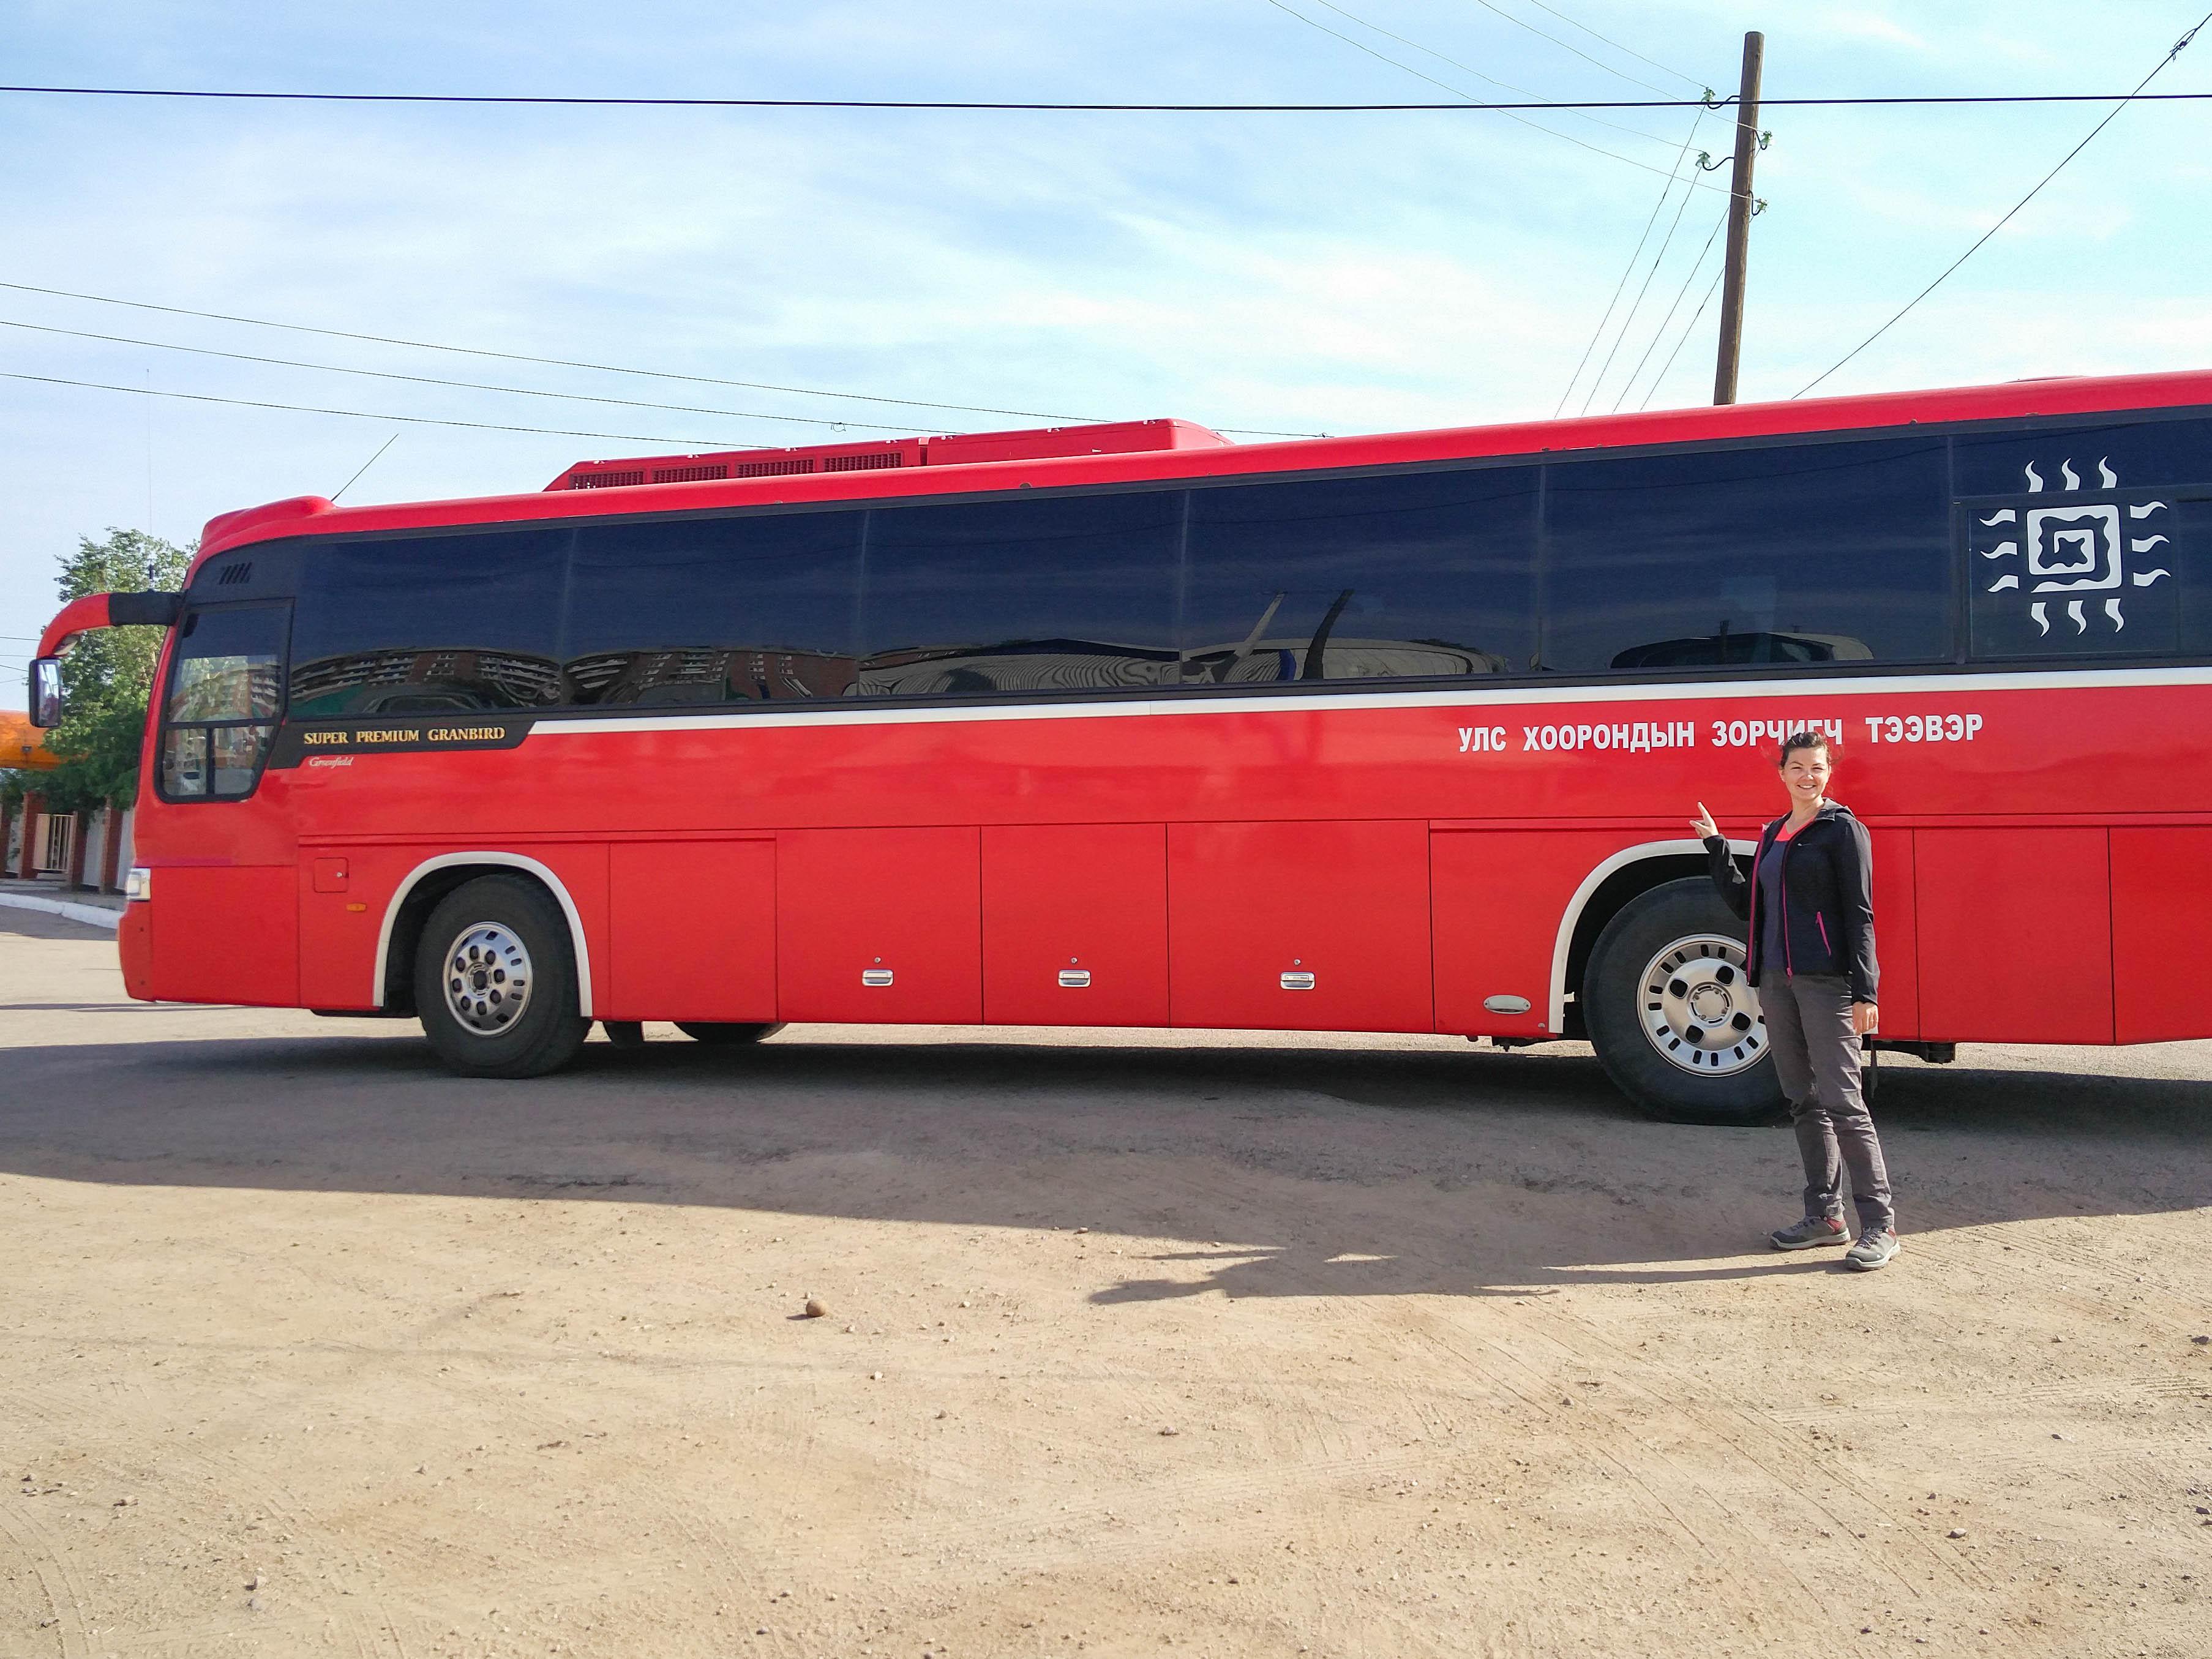 Trajet Russie – Mongolie en bus